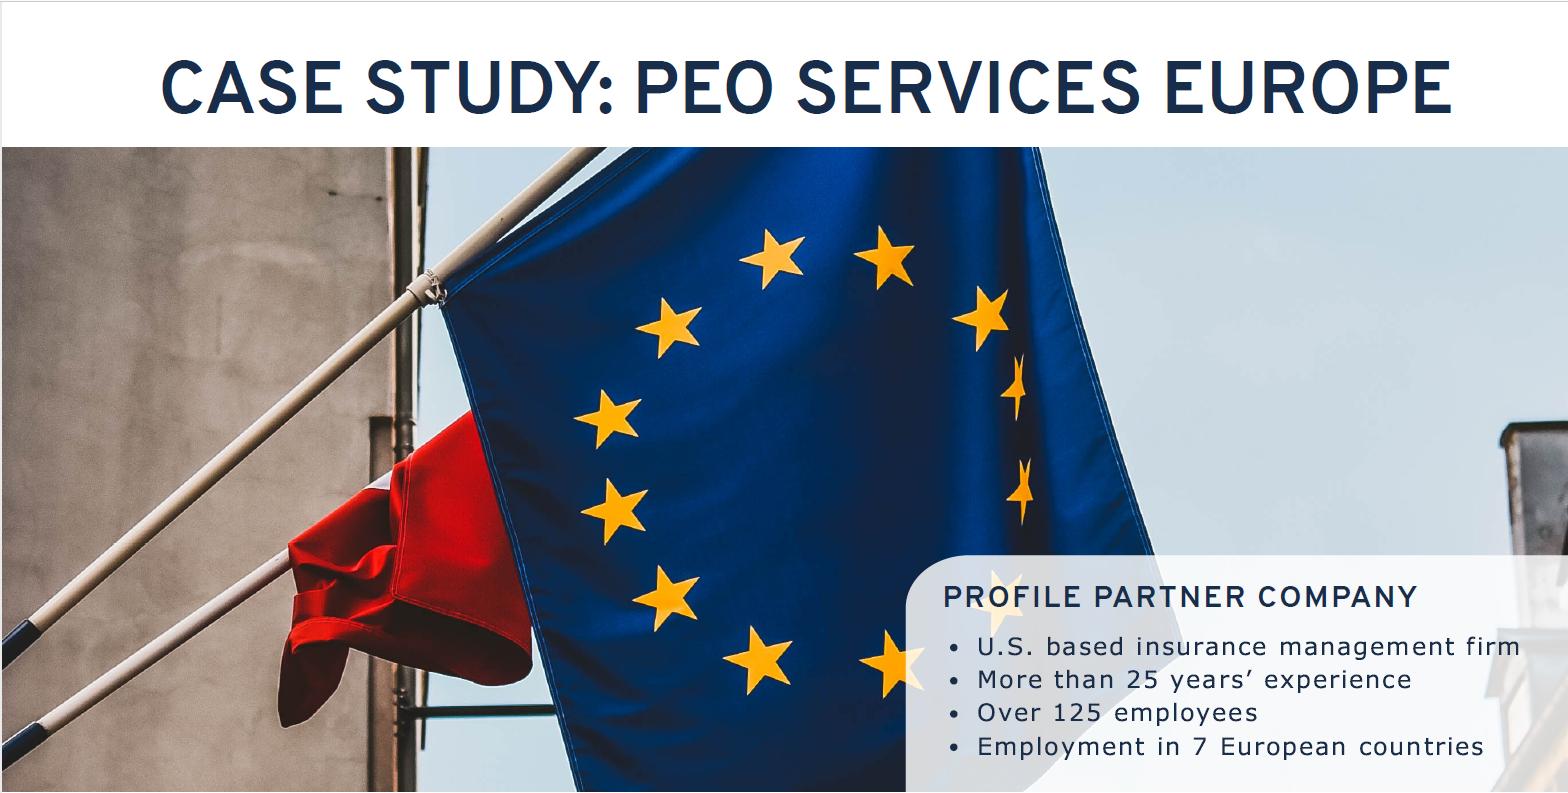 Case Study PEO Services